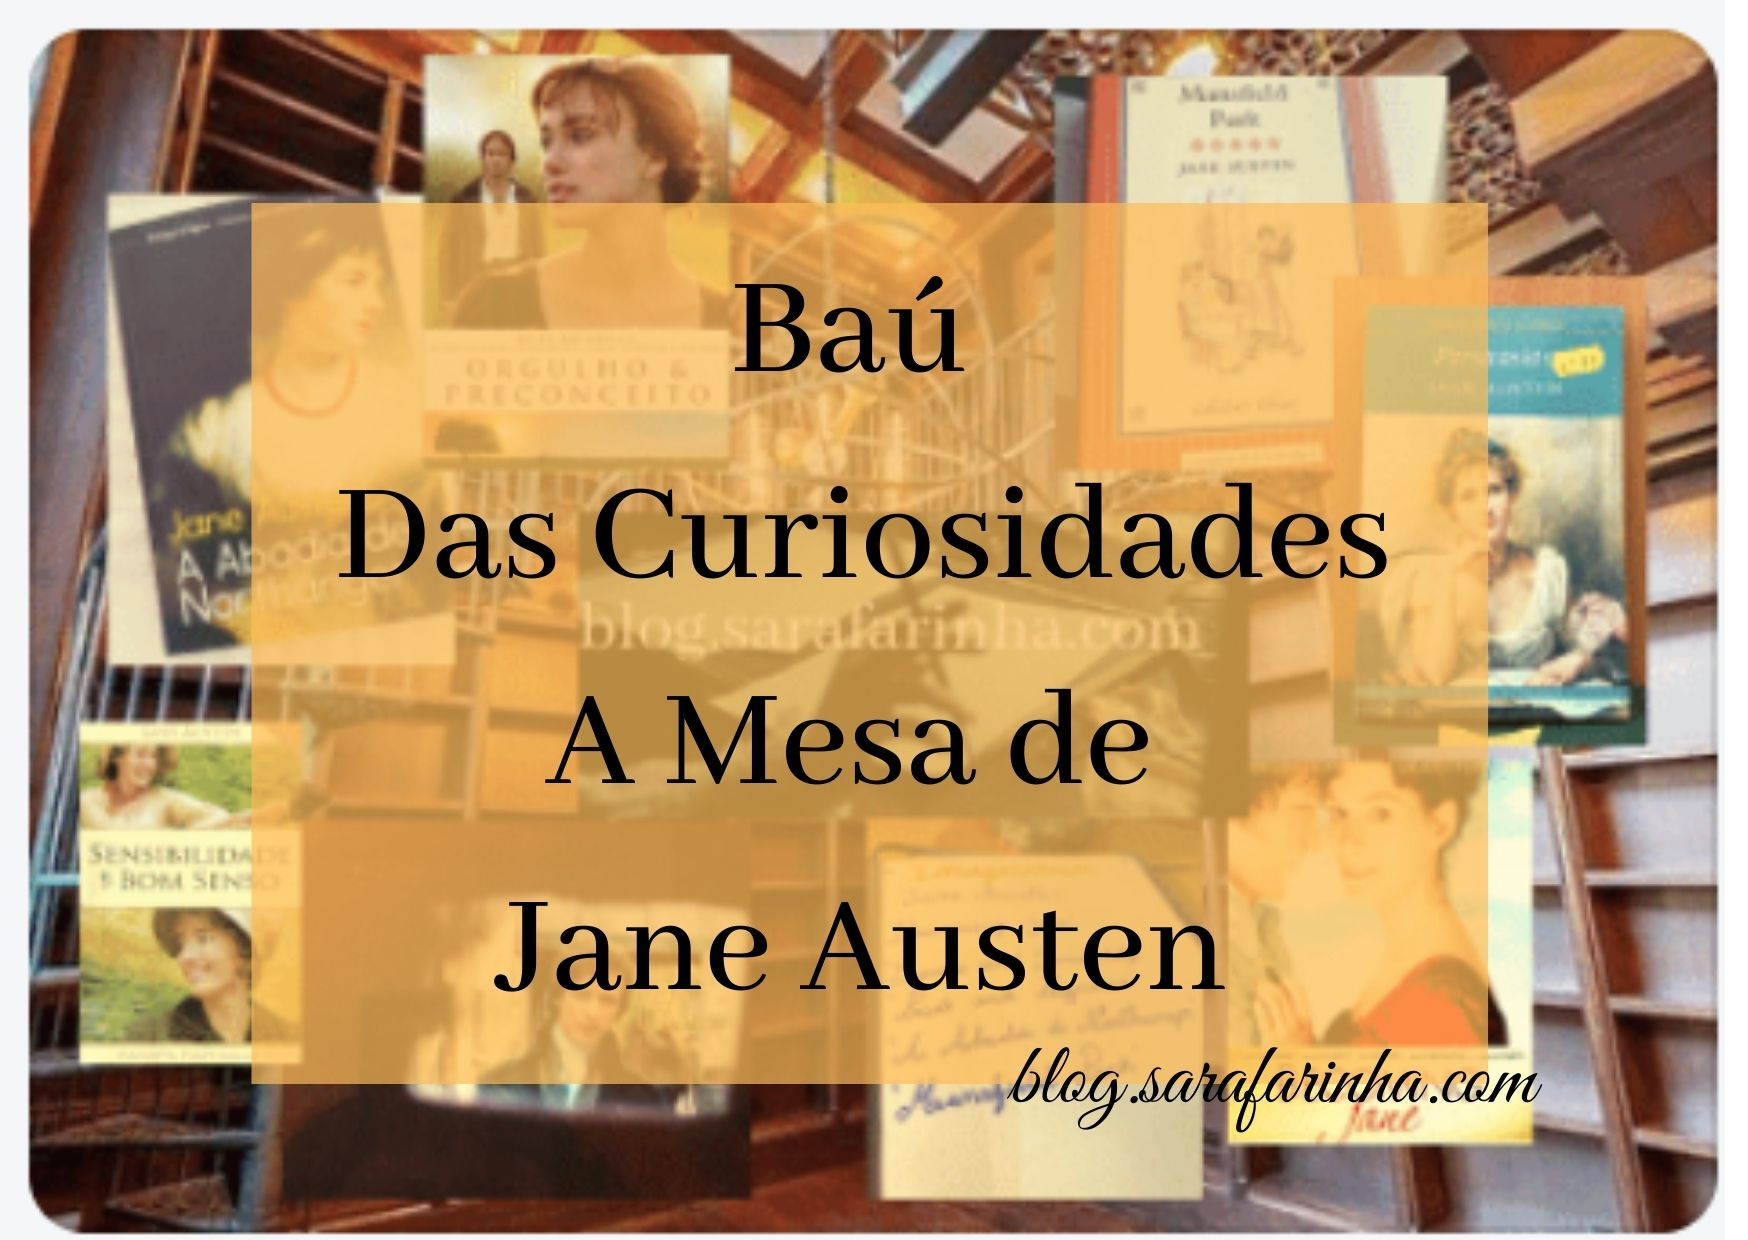 a mesa de Jane Austen